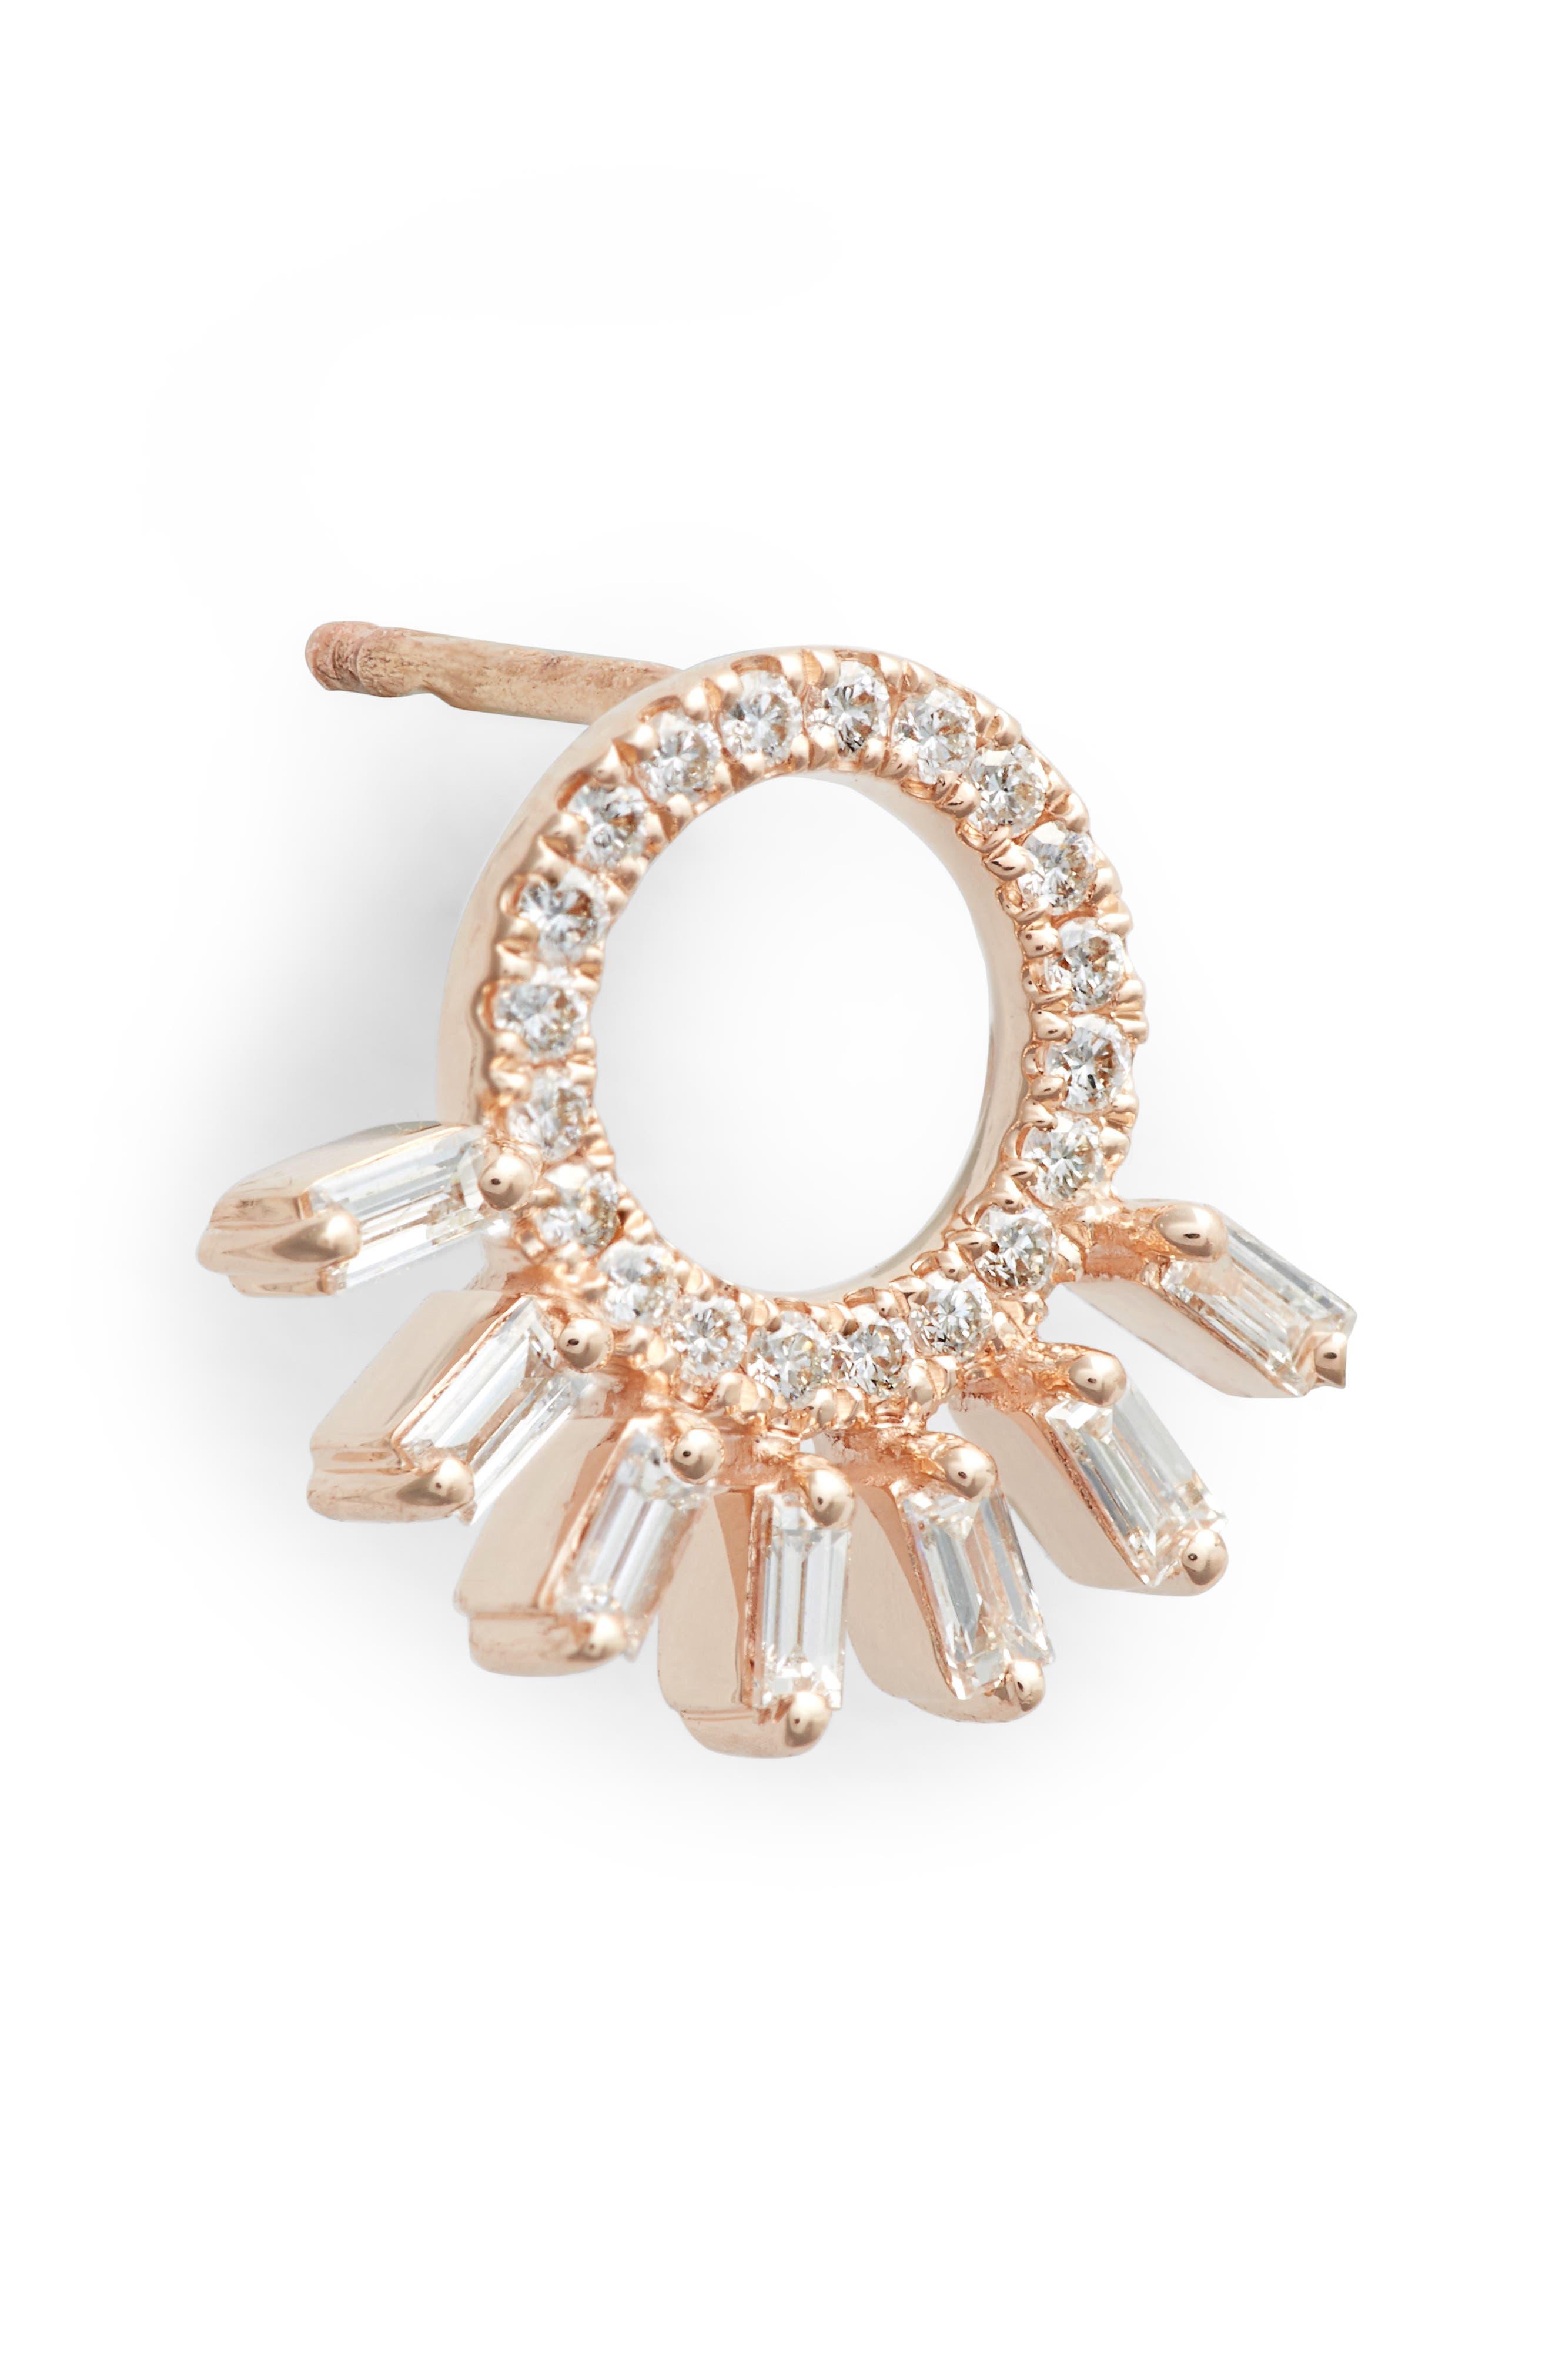 Dana Rebecca Sadie Starburst Stud Earrings,                             Alternate thumbnail 5, color,                             ROSE GOLD